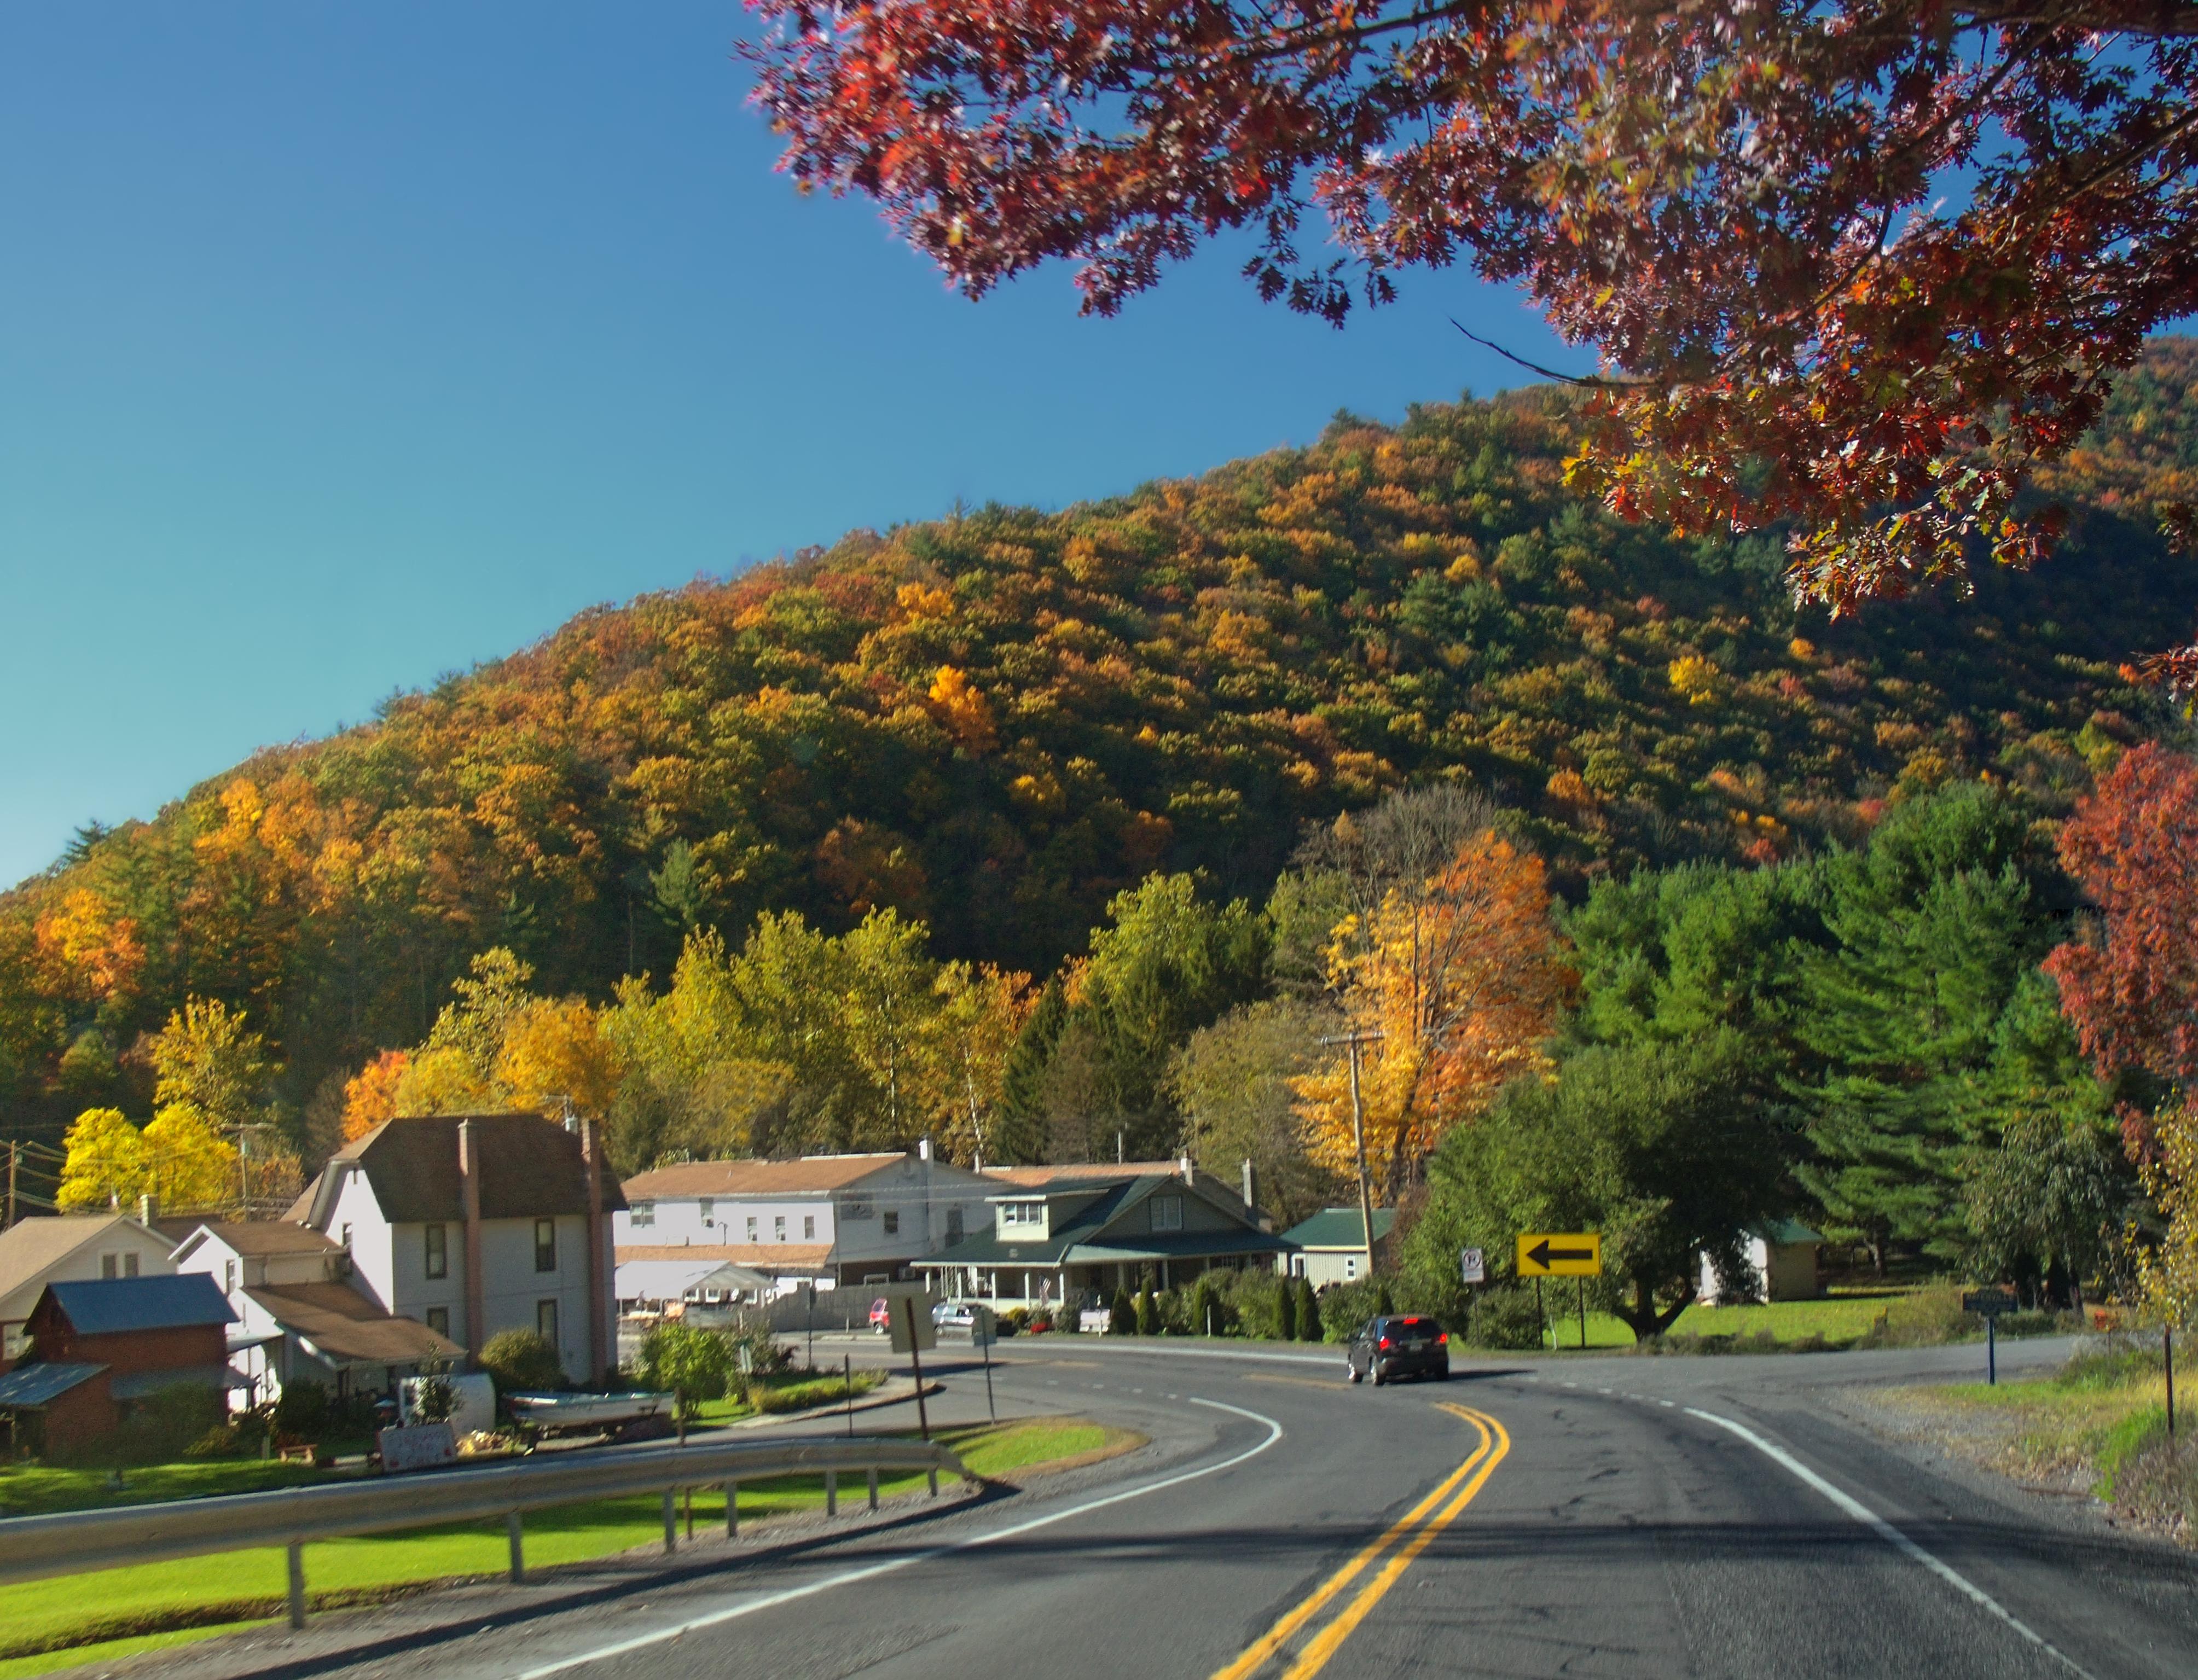 File:Waterville, Pennsylvania.jpg - Wikimedia Commons